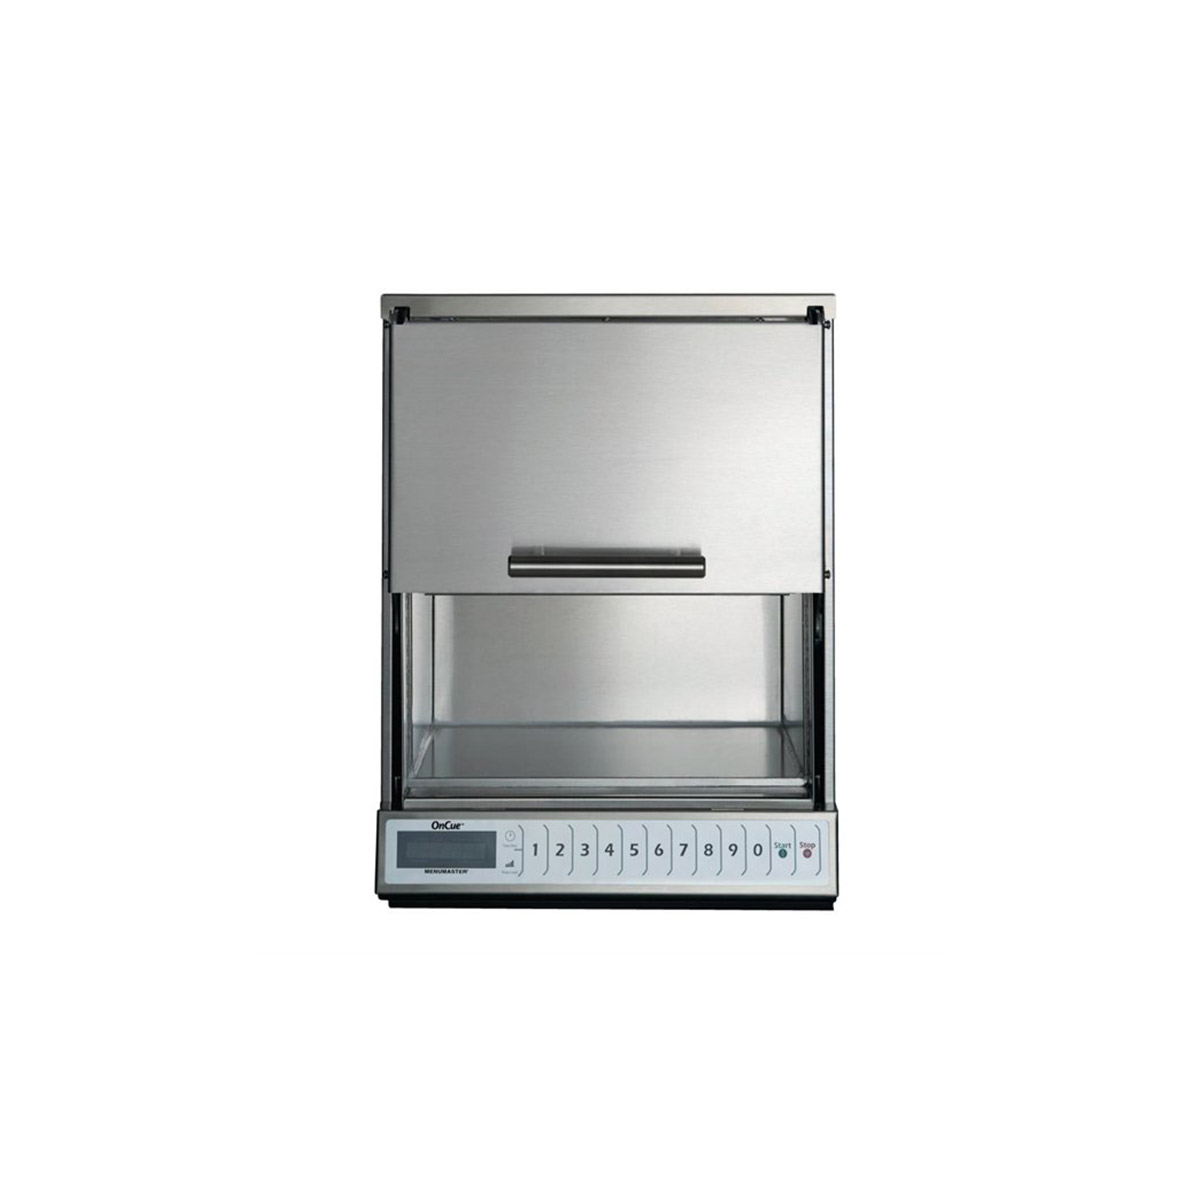 Menumaster Pop Up Door Microwave MOC5241